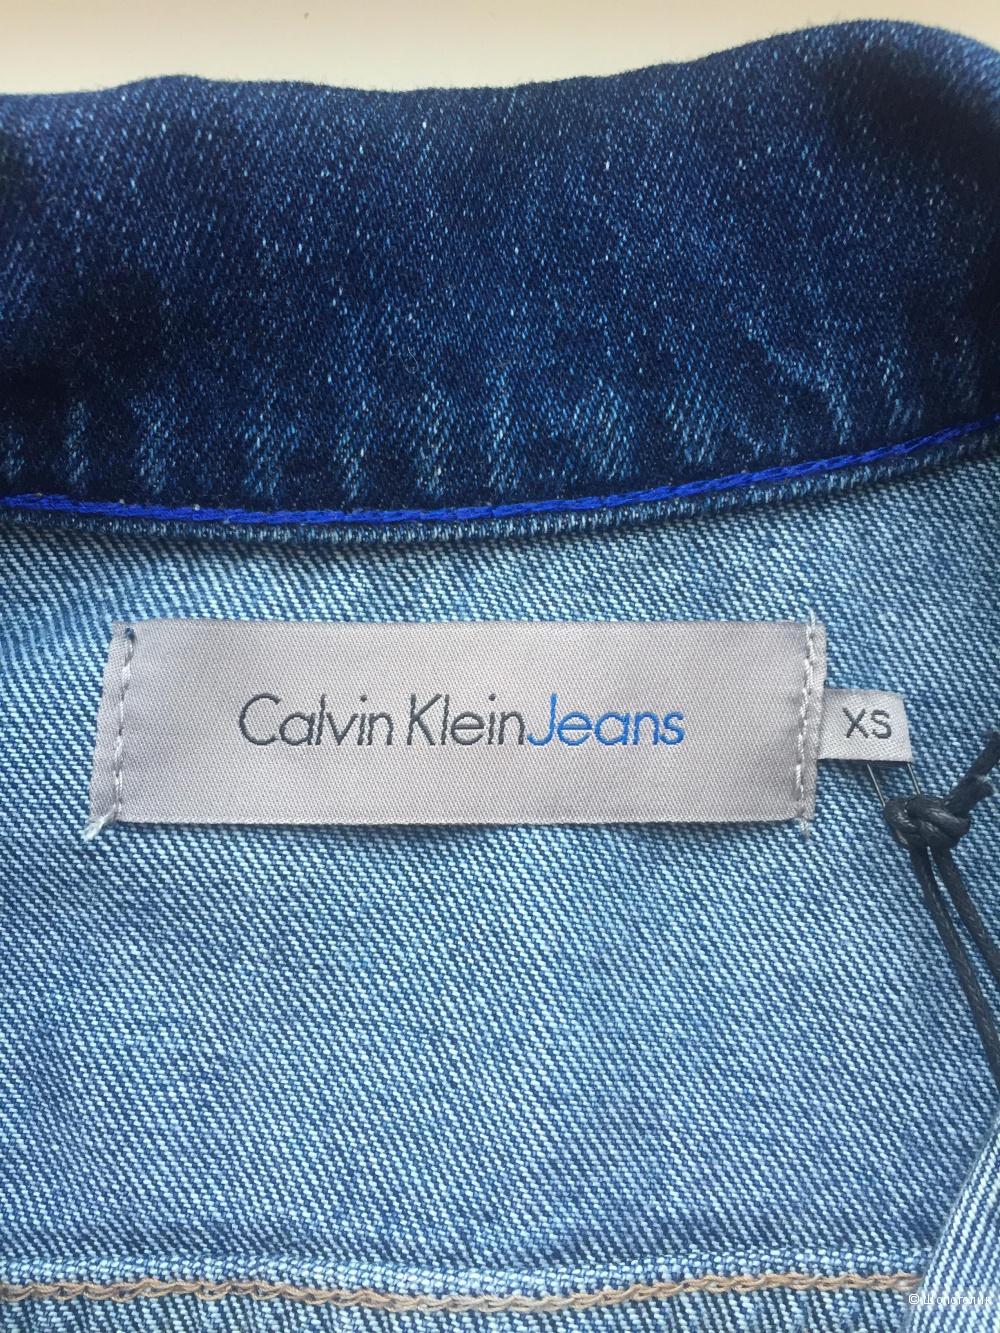 Джинсовка женская Calvin Klein, р.xs(наш р.44-46)